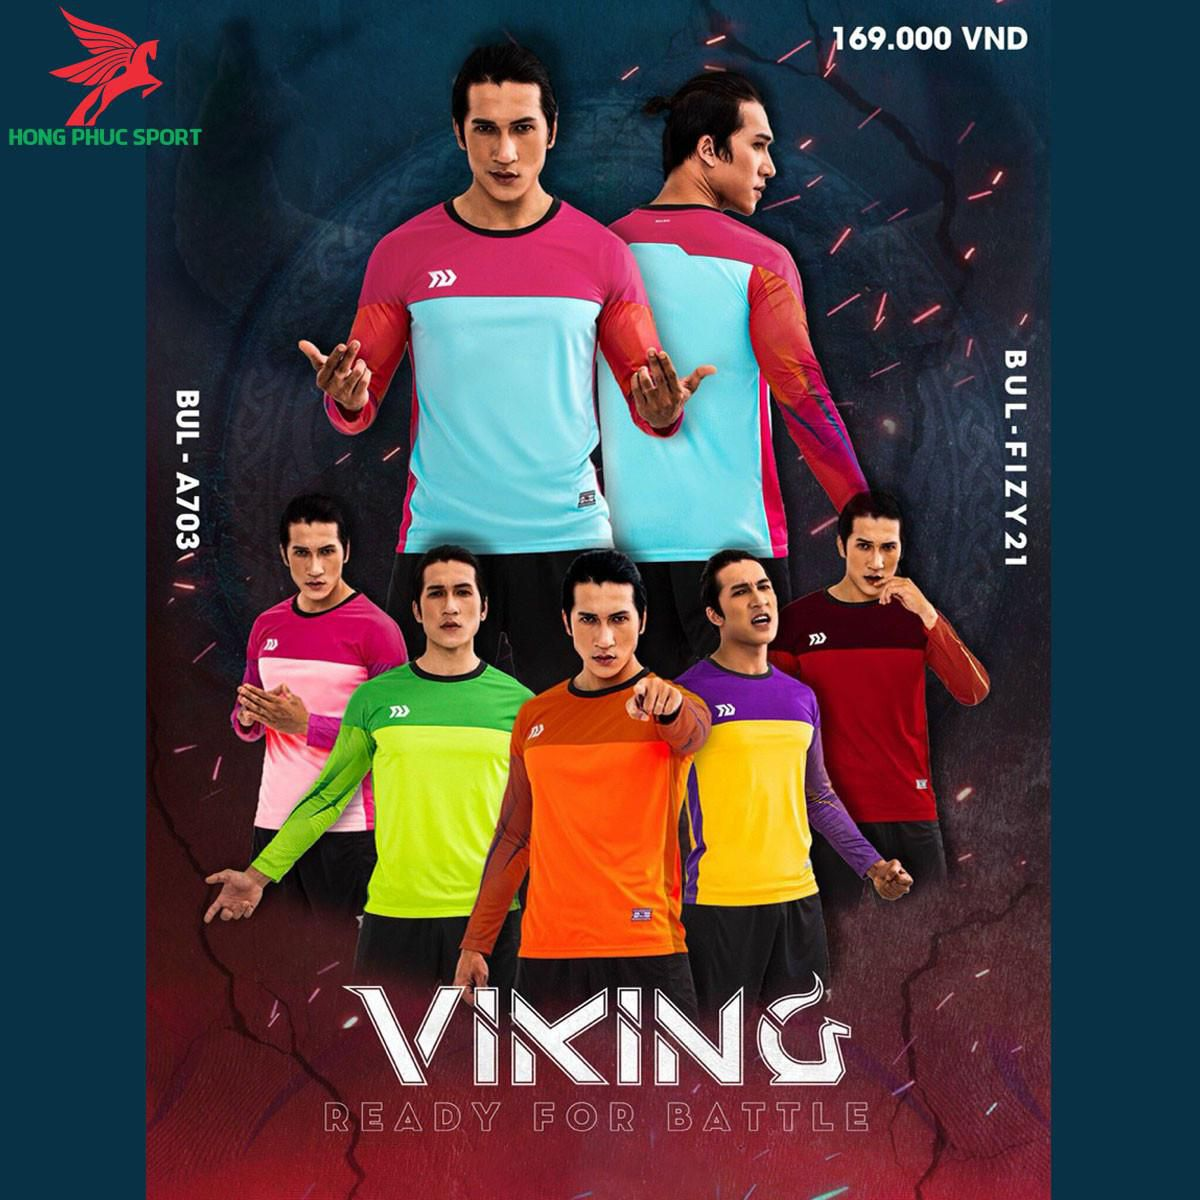 https://cdn.hongphucsport.com/unsafe/s4.shopbay.vn/files/285/ao-thu-mon-khong-logo-bulbal-viking-60516086d2fdf.jpg